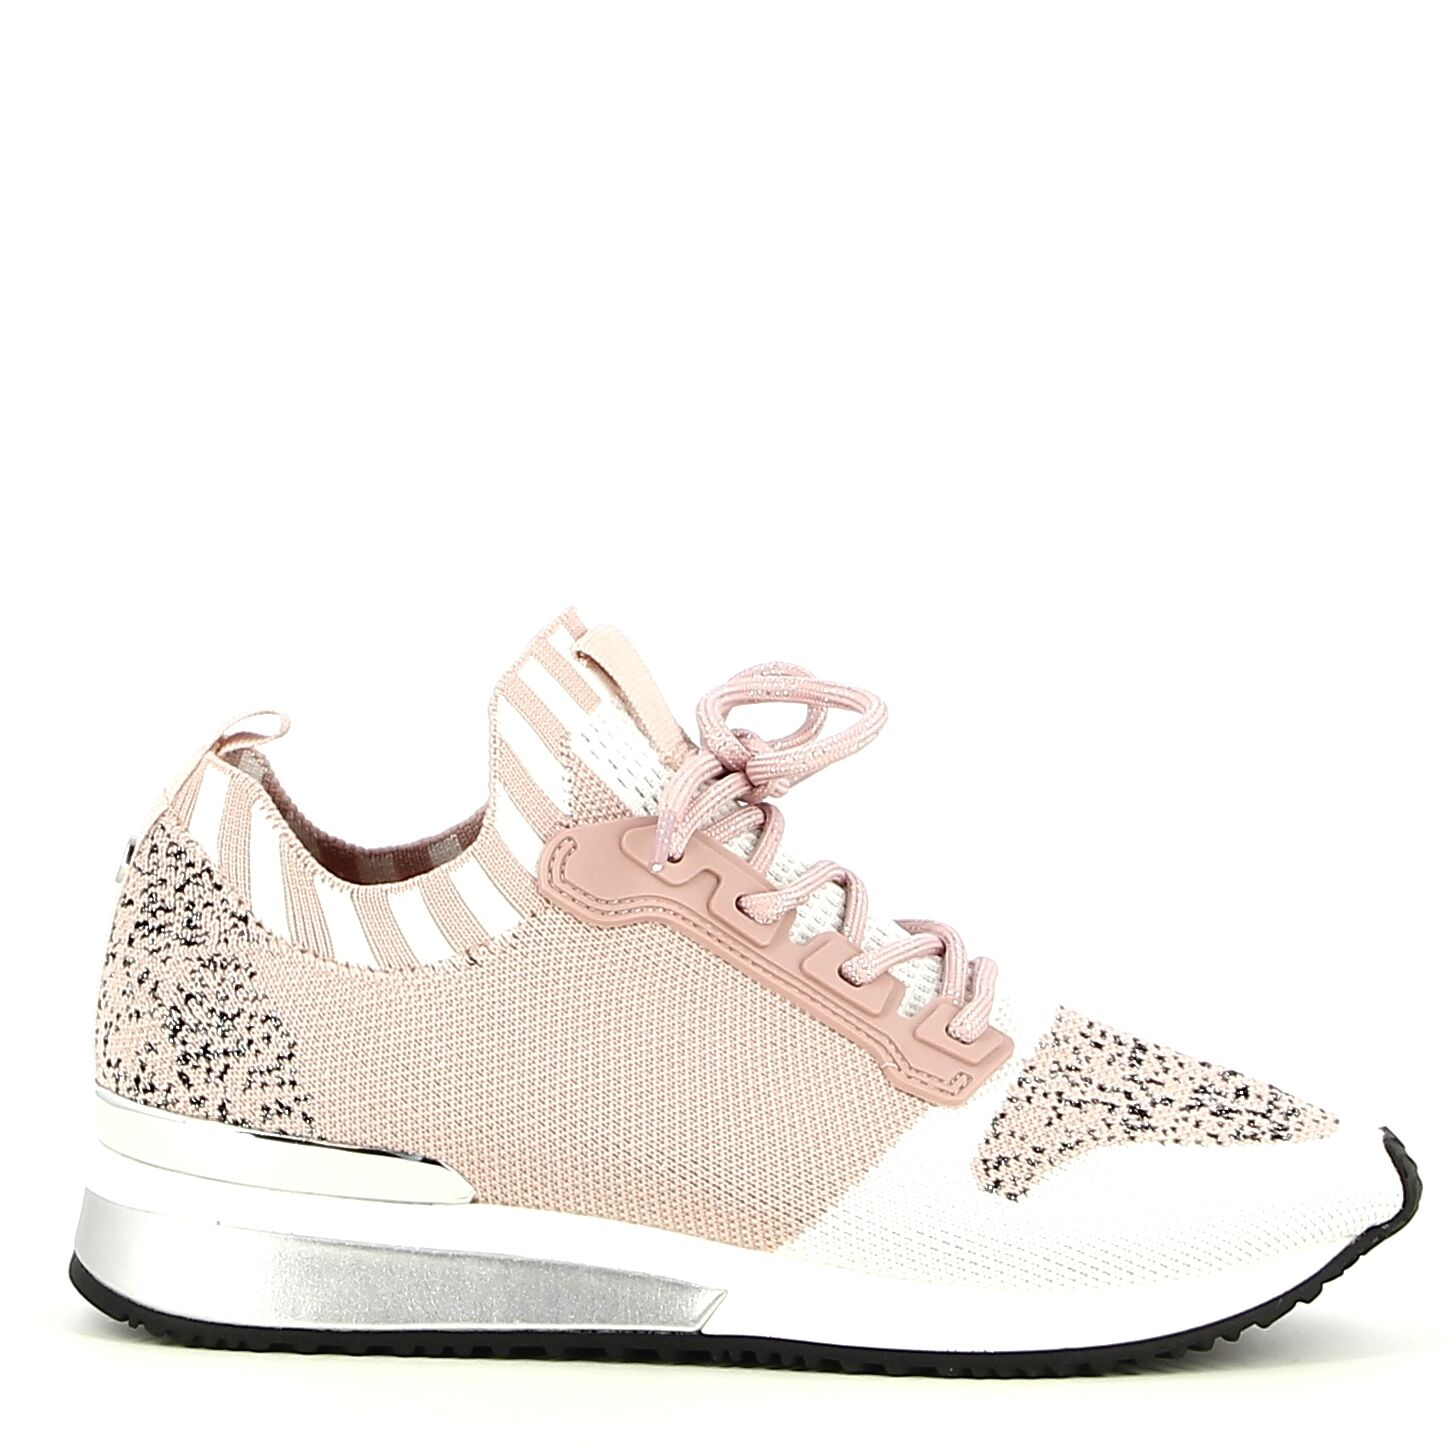 La Strada - Nude/Wit - Sneakers